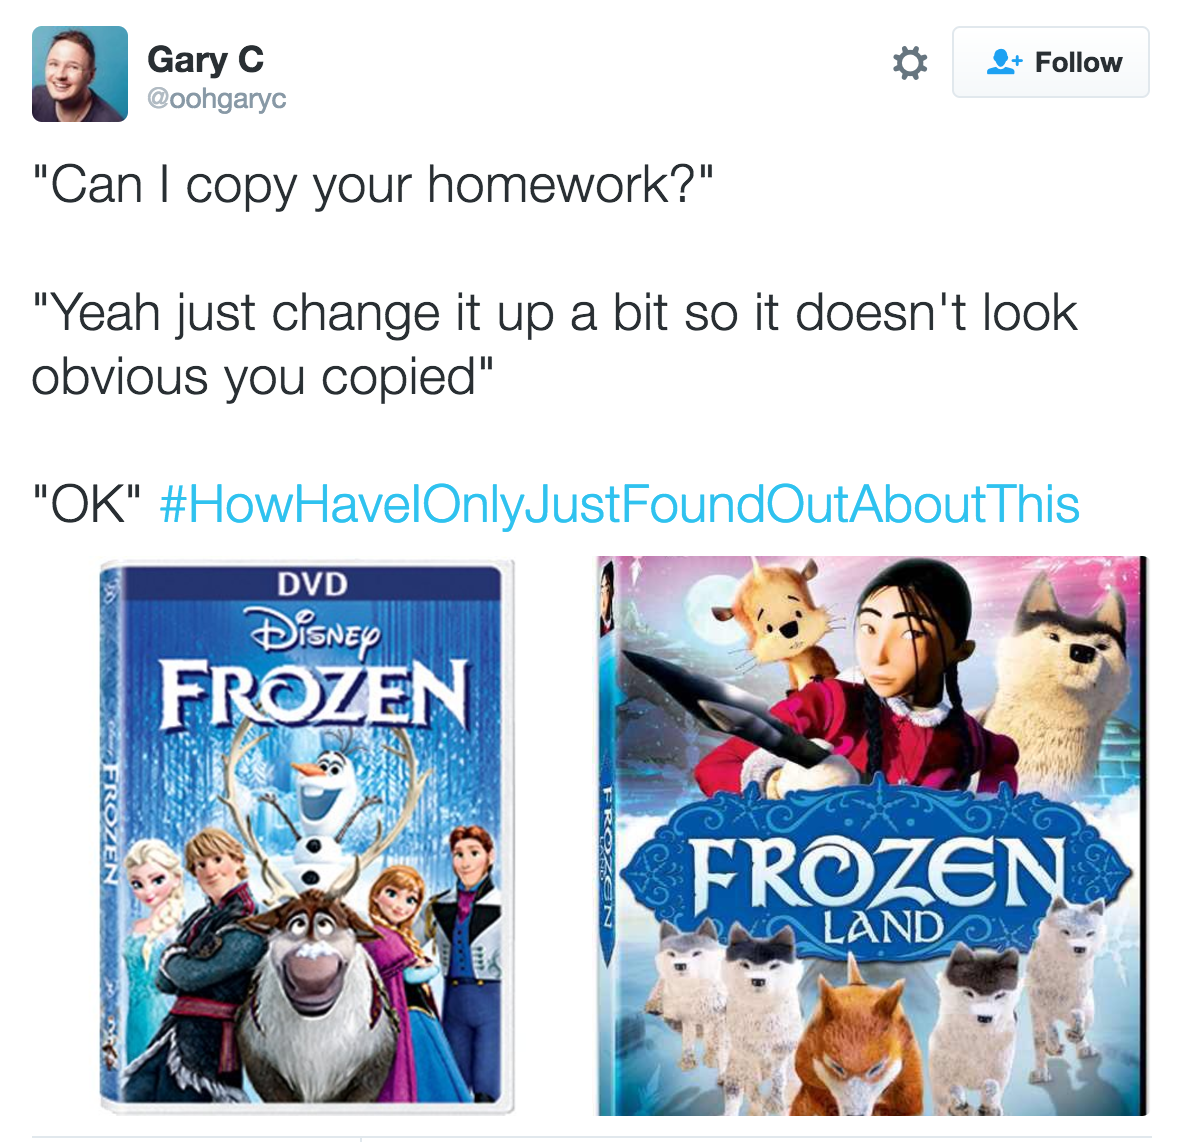 Copying homework story